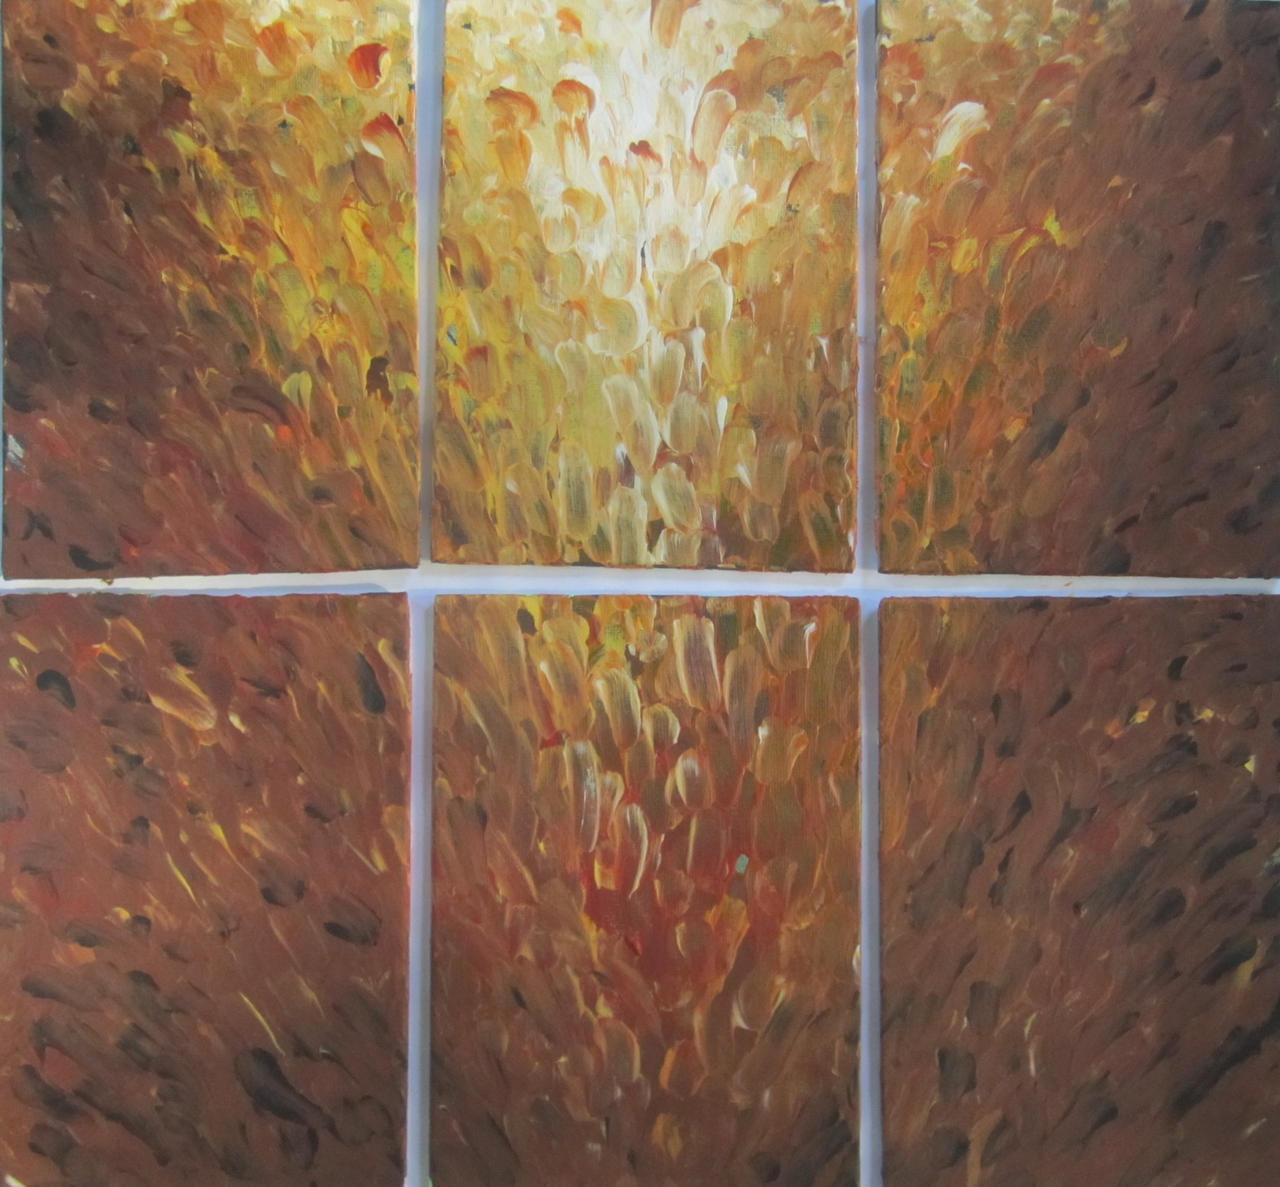 Heavenly Explosion by juliarita